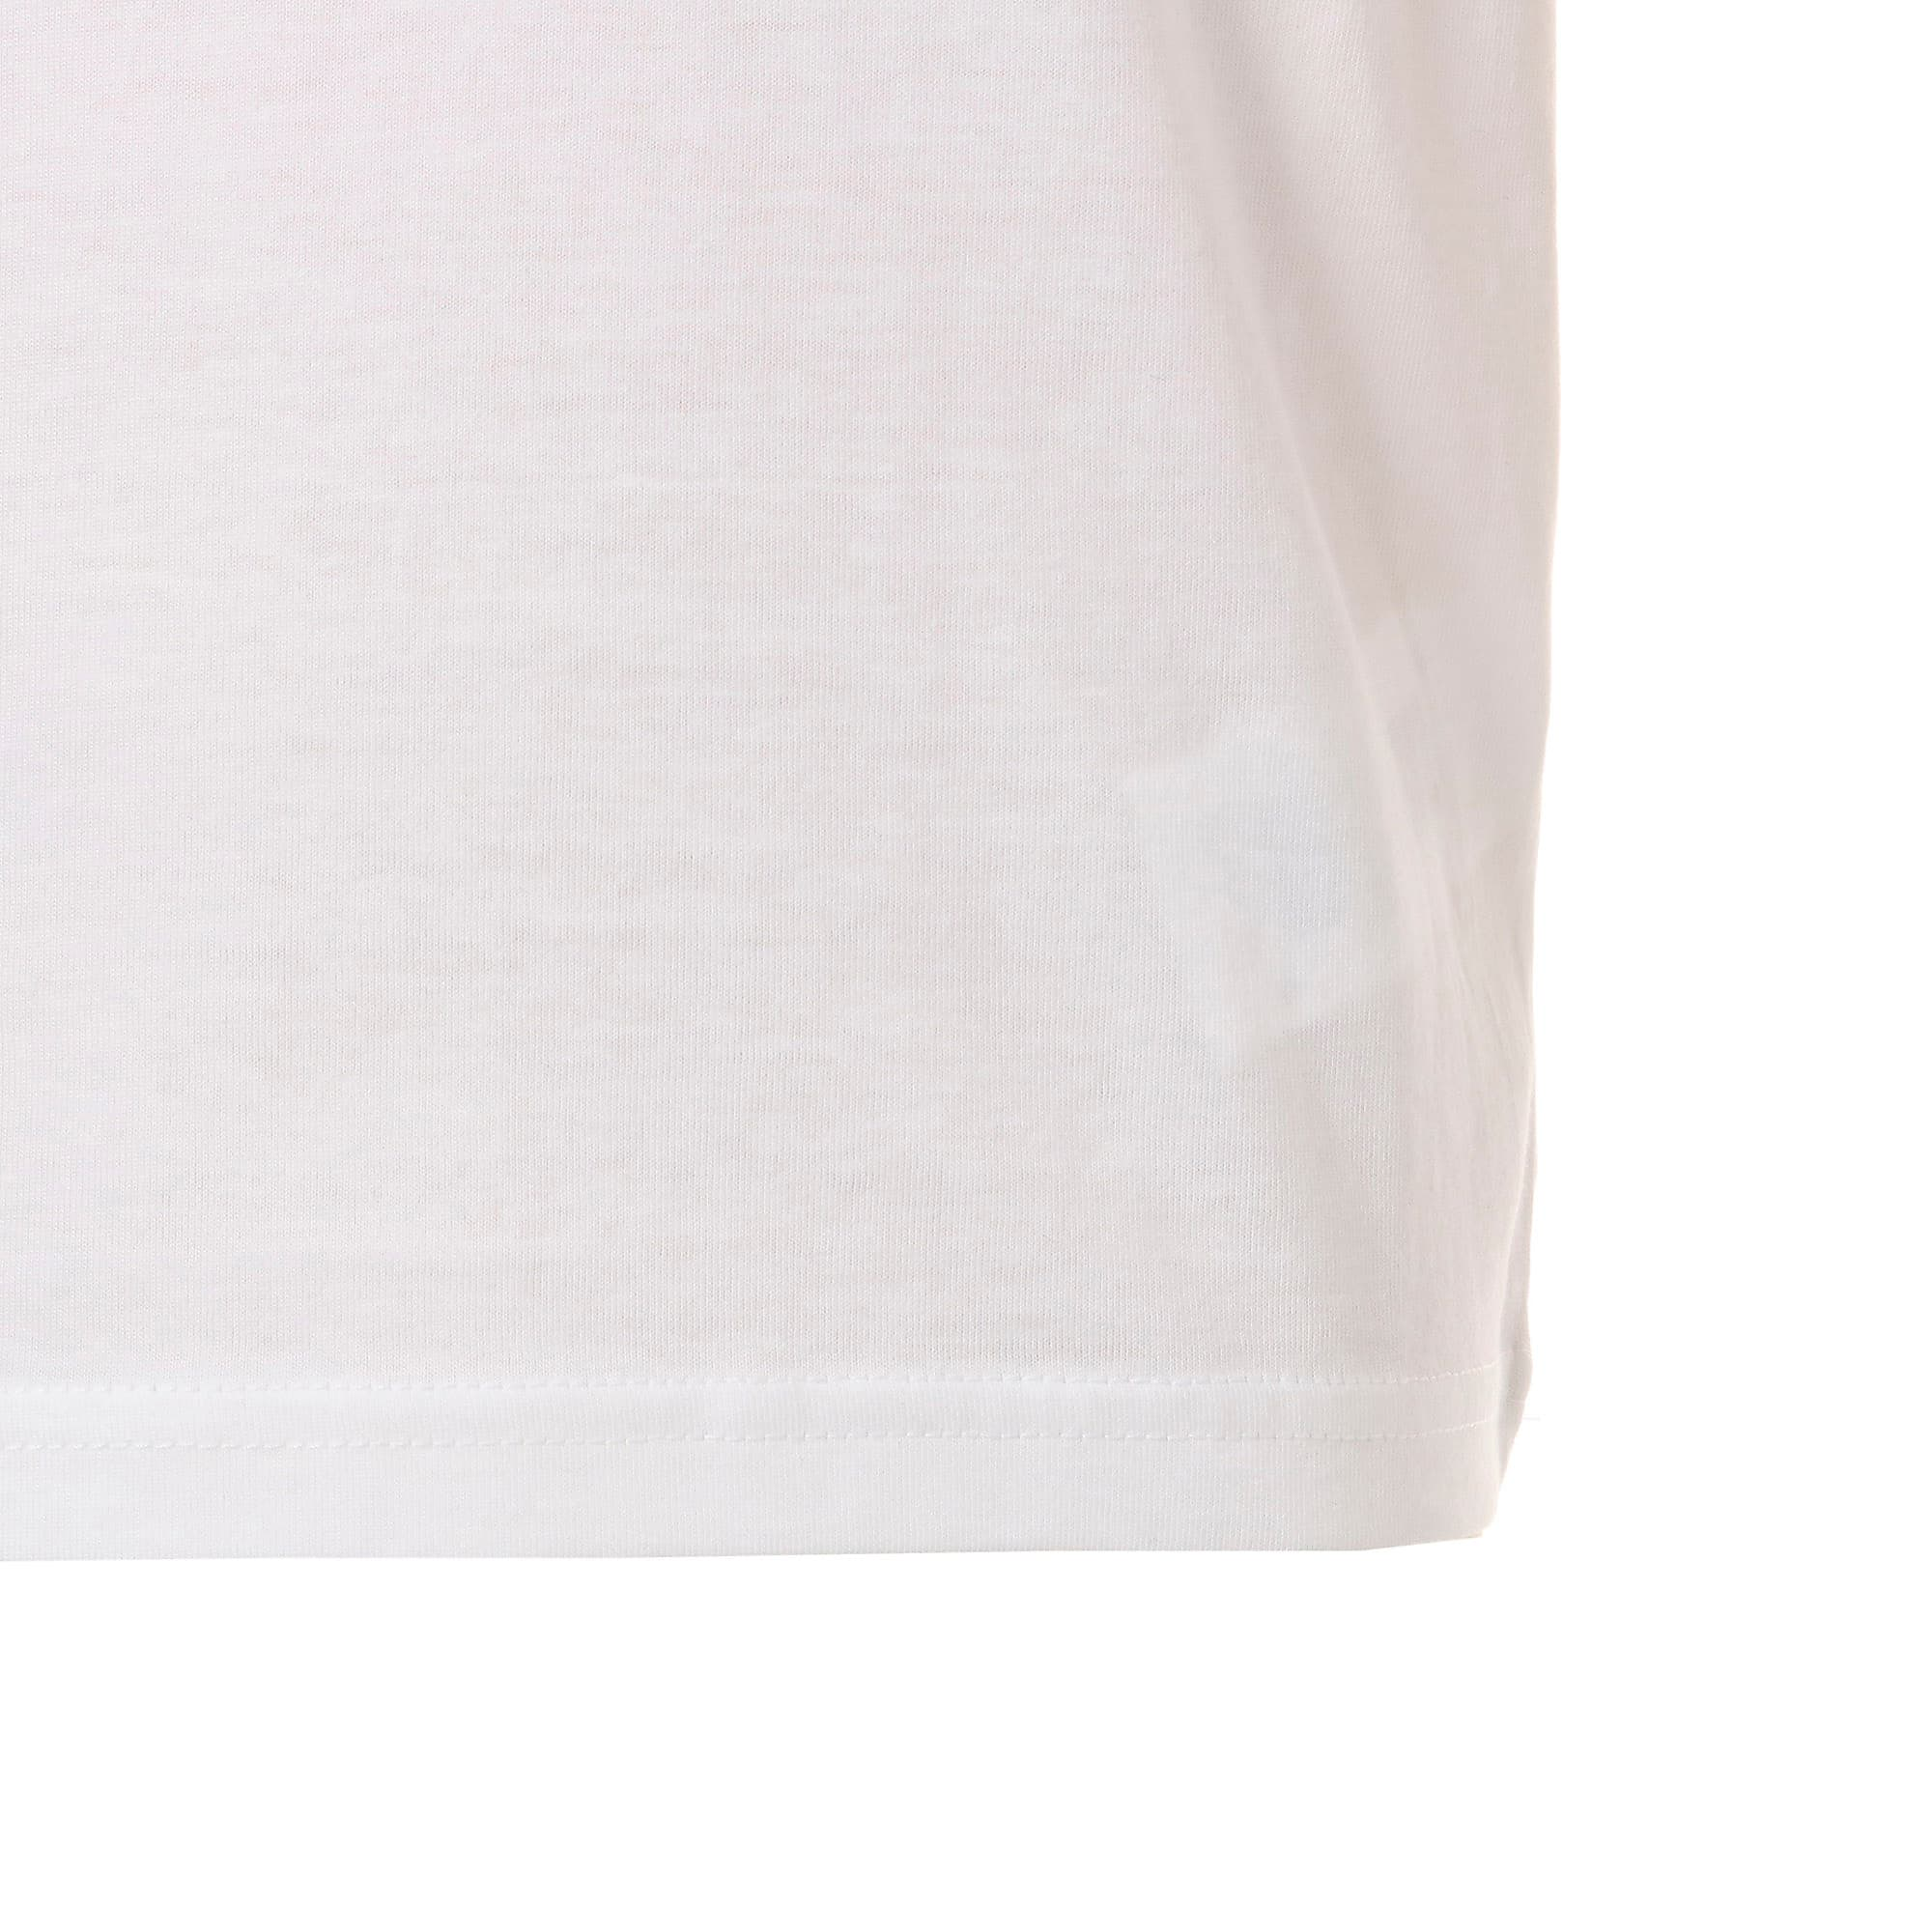 Thumbnail 6 of キッズ ALPHA SS トレンド Tシャツ 半袖, Puma Black, medium-JPN